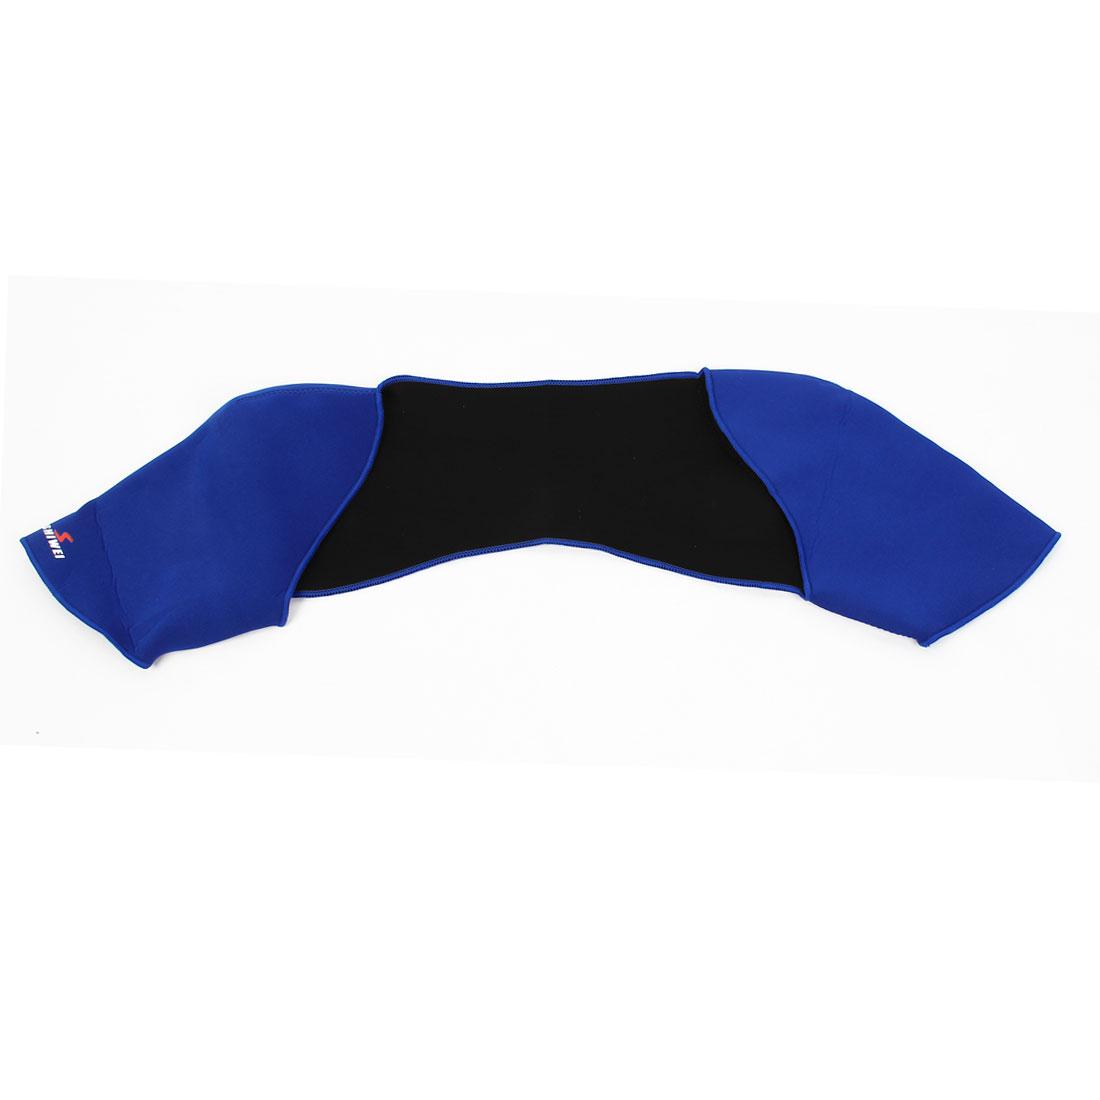 Neoprene Sport Double Shoulder Elastic Support Arthritis Injury Brace Protector Blue